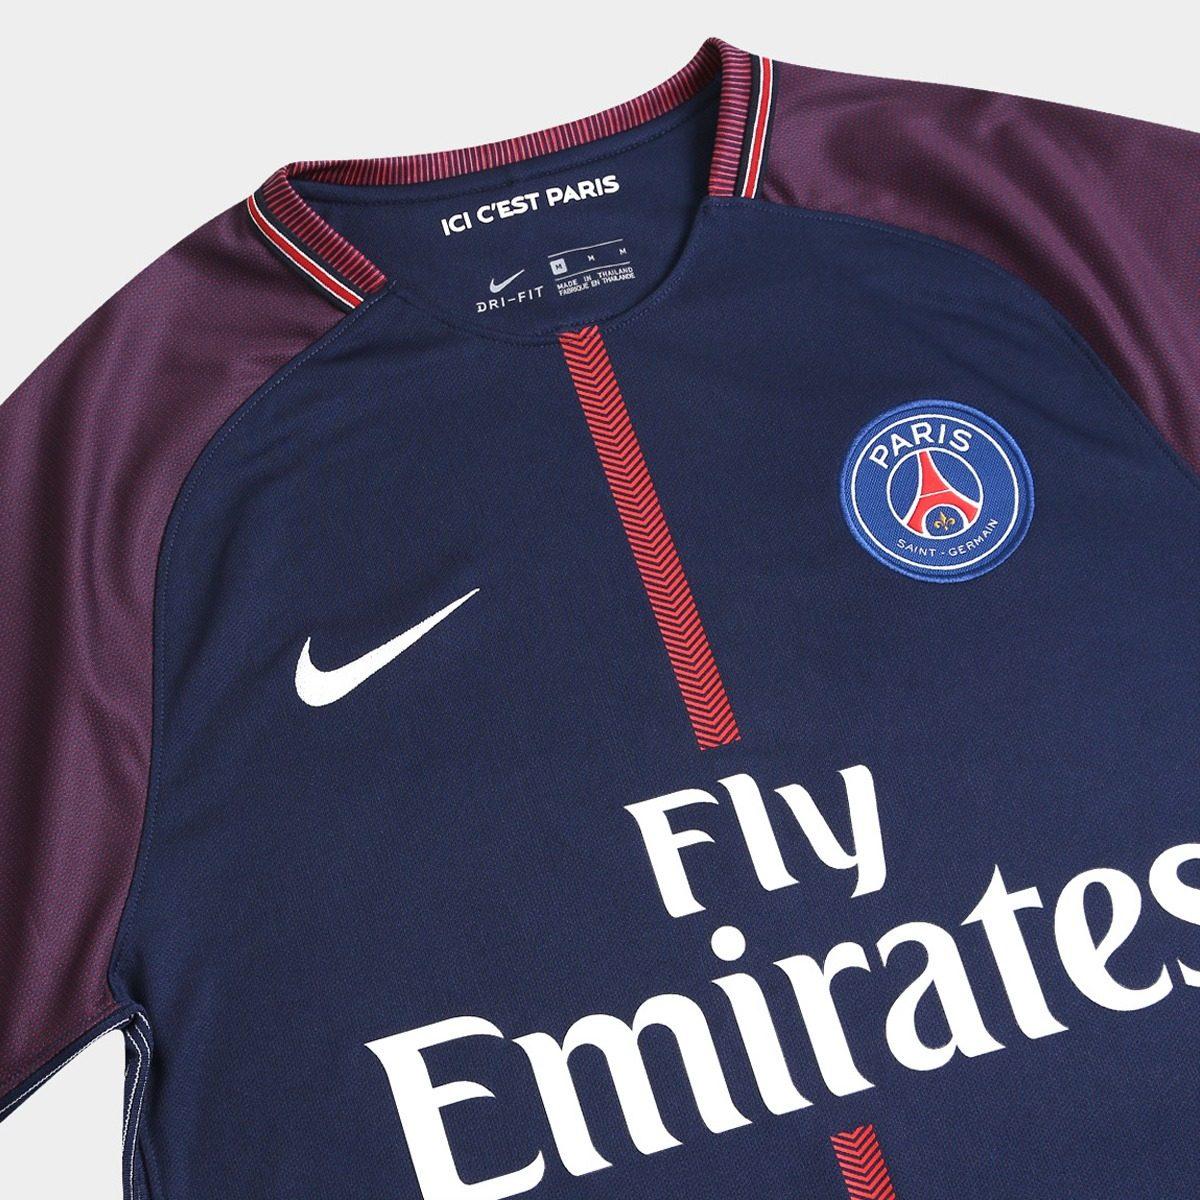 f80a8f6b00d31 Camisa Paris Saint Germain Home 17 18 S nº Torcedor Nike - R  100